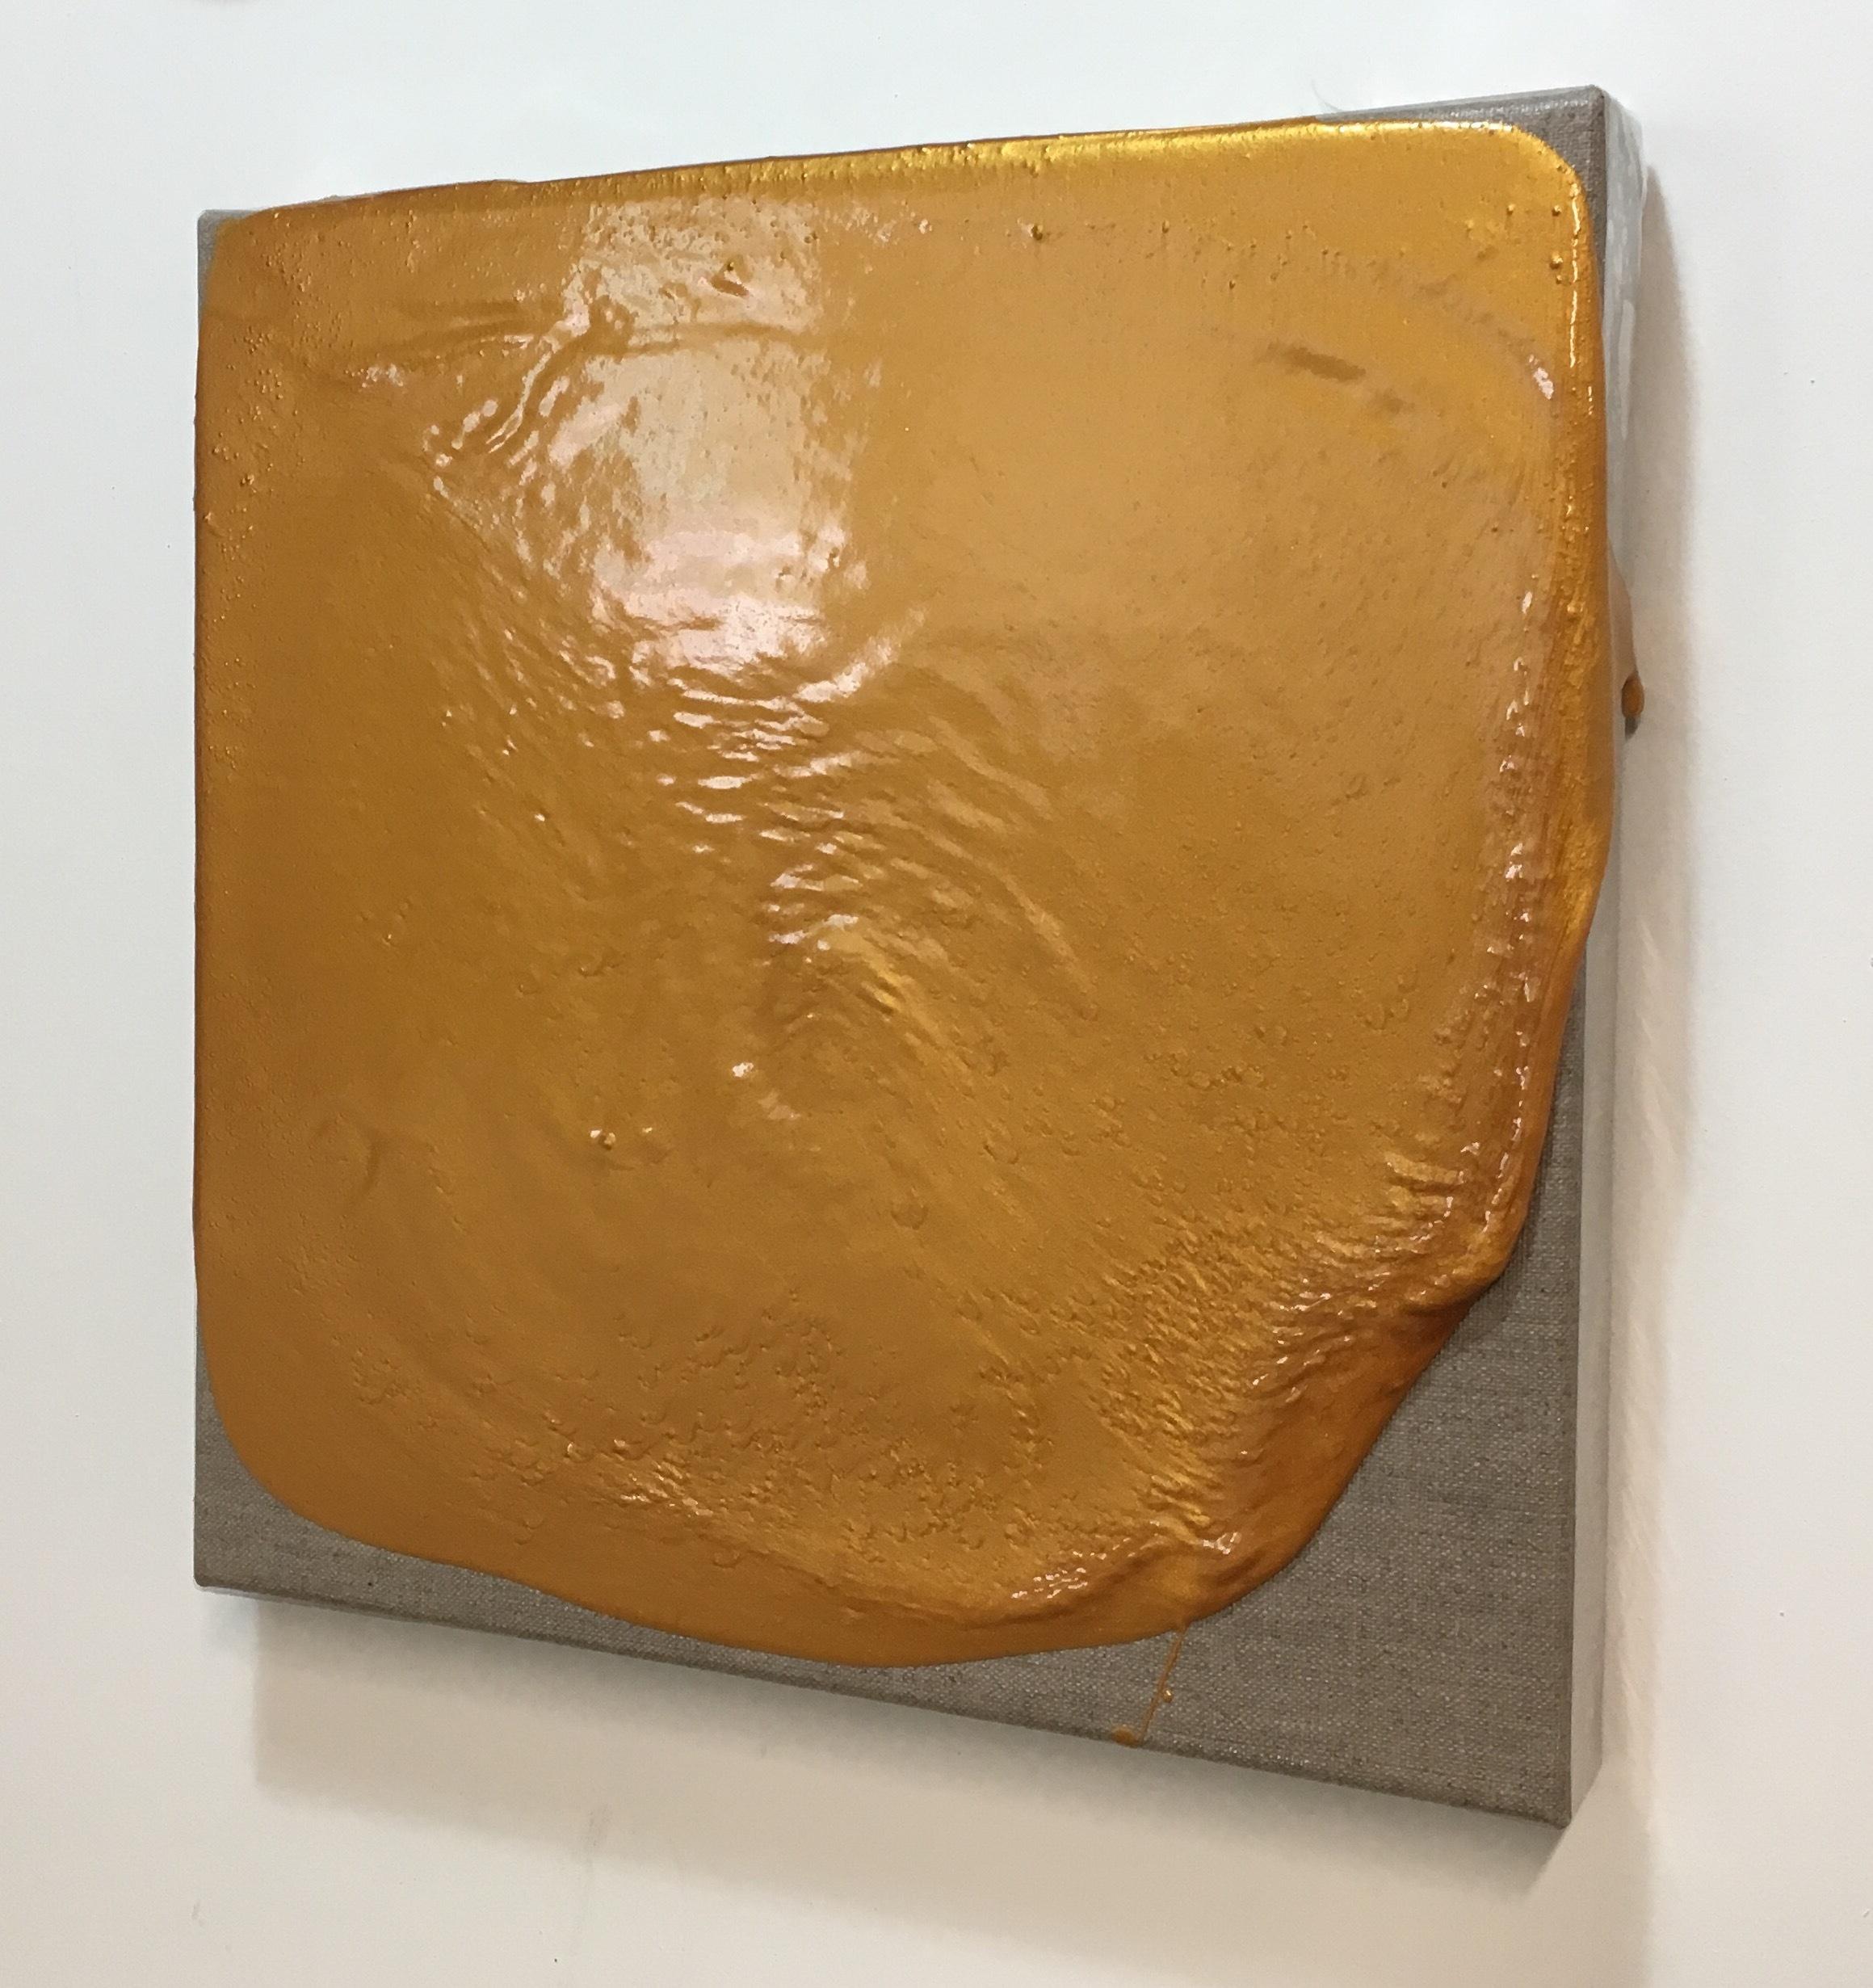 "John Tallman, Untitled (gold), metallic pigment and urethane plastic on linen, 12""x12"", 2016"